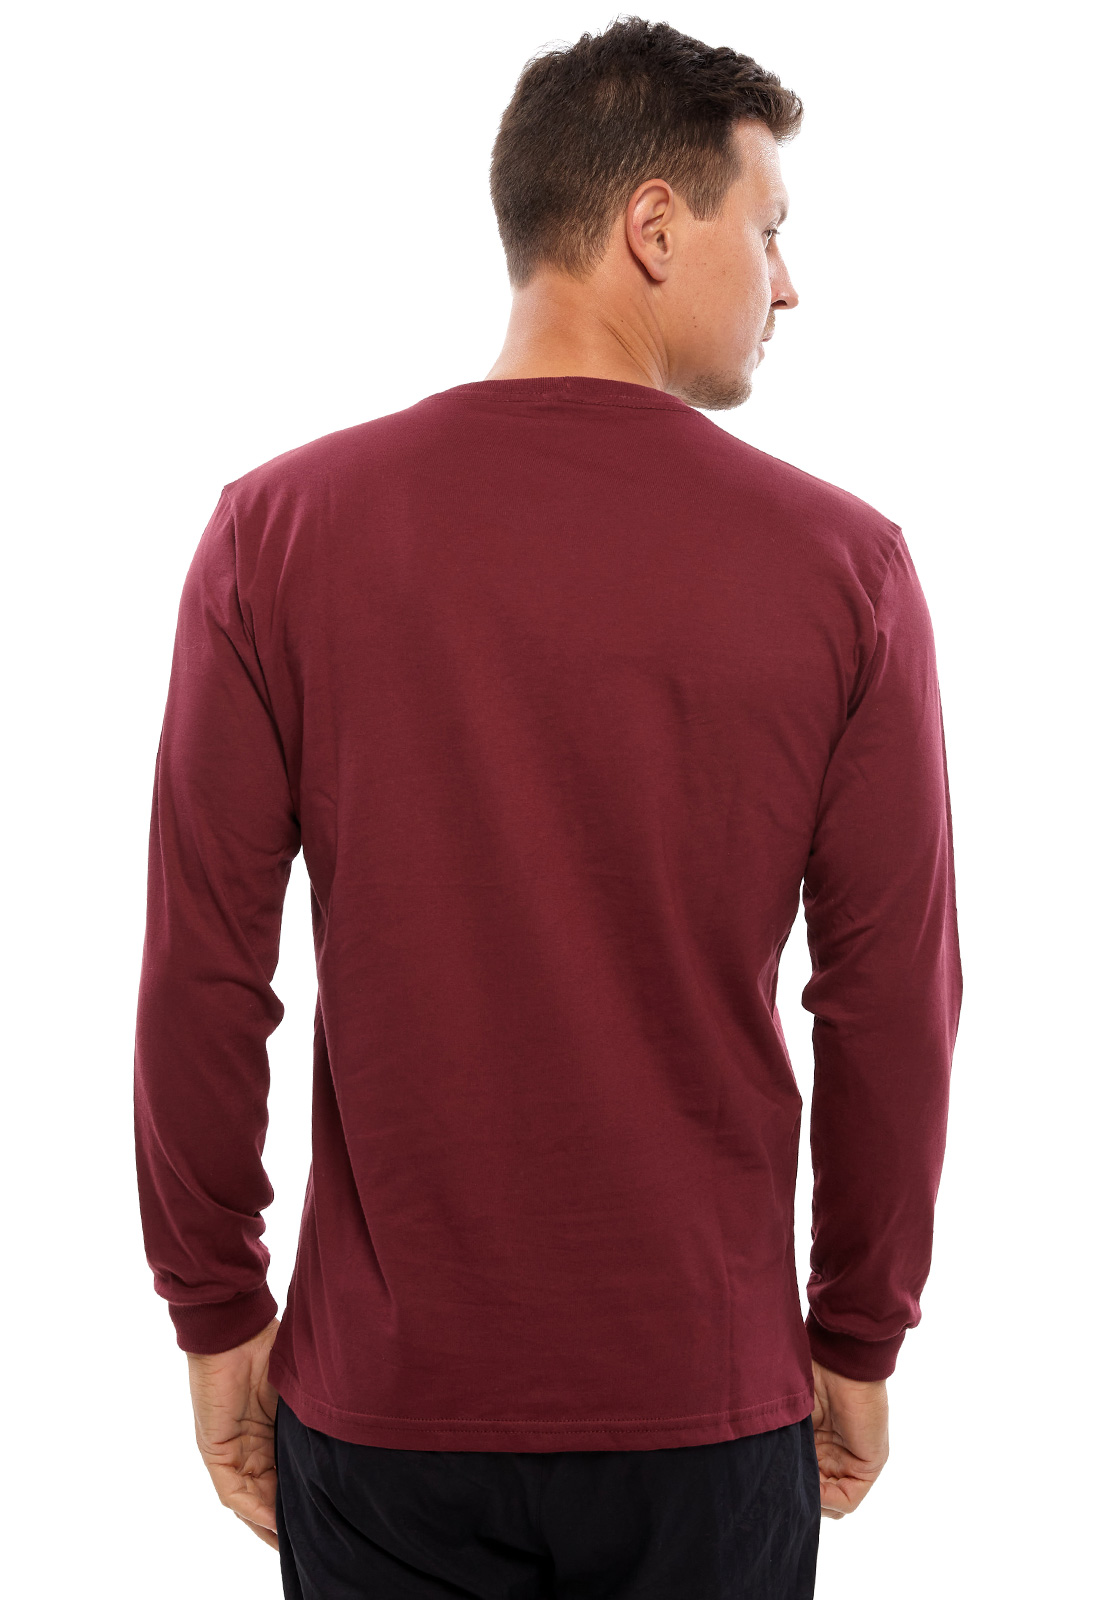 Camiseta Vida Marinha Manga Longa Bordô/Preto/Cinza